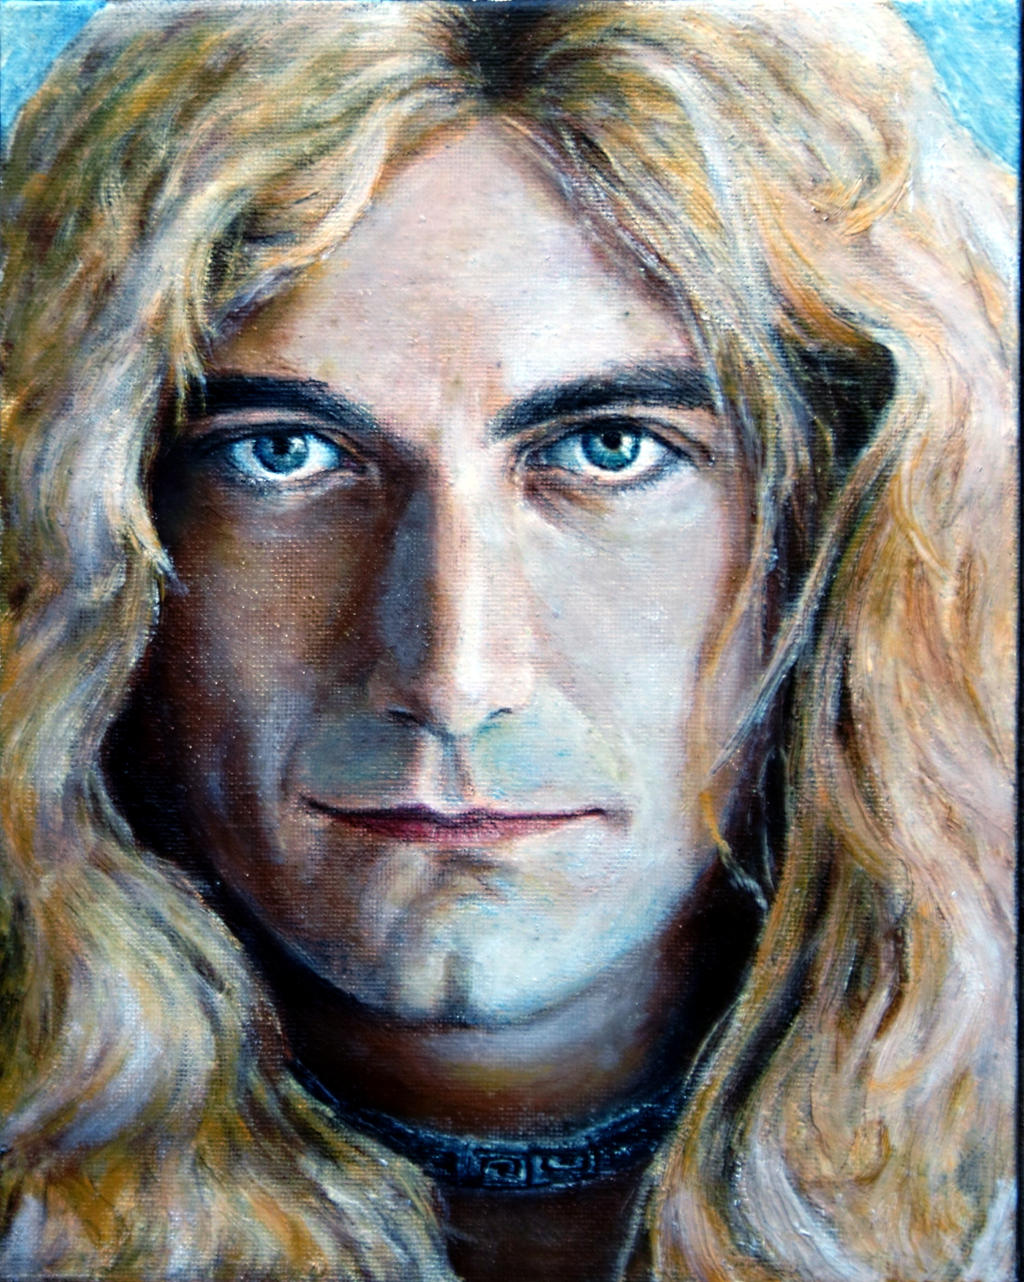 Happy 67th Birthday to Robert Plant Robert_Plant_by_IA2009